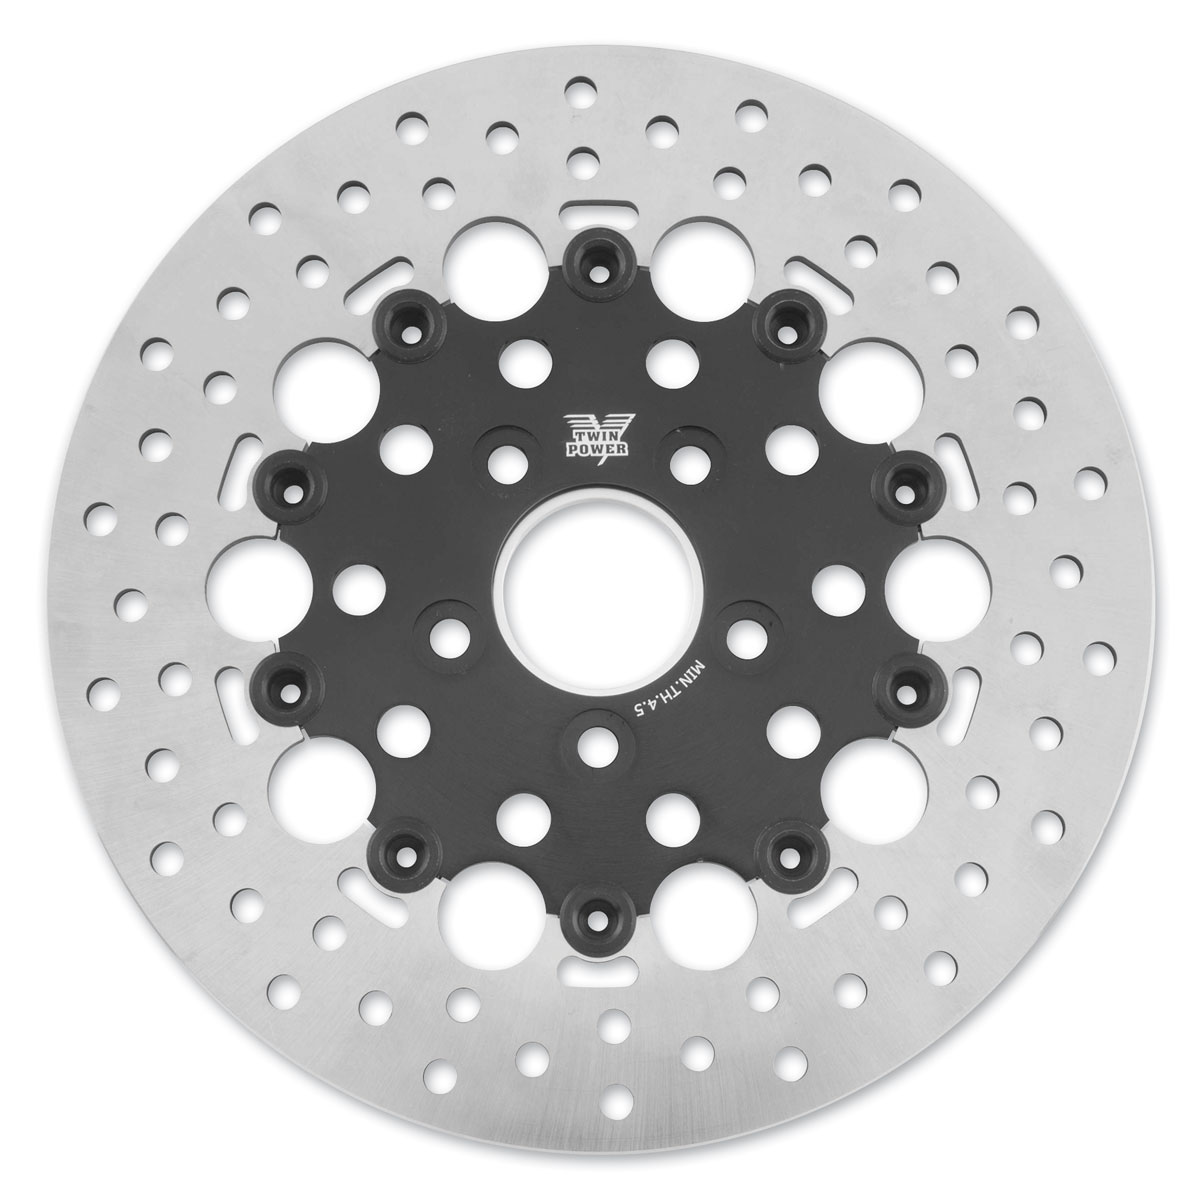 Twin Power Rear Black Floating Round Hole Brake Rotors